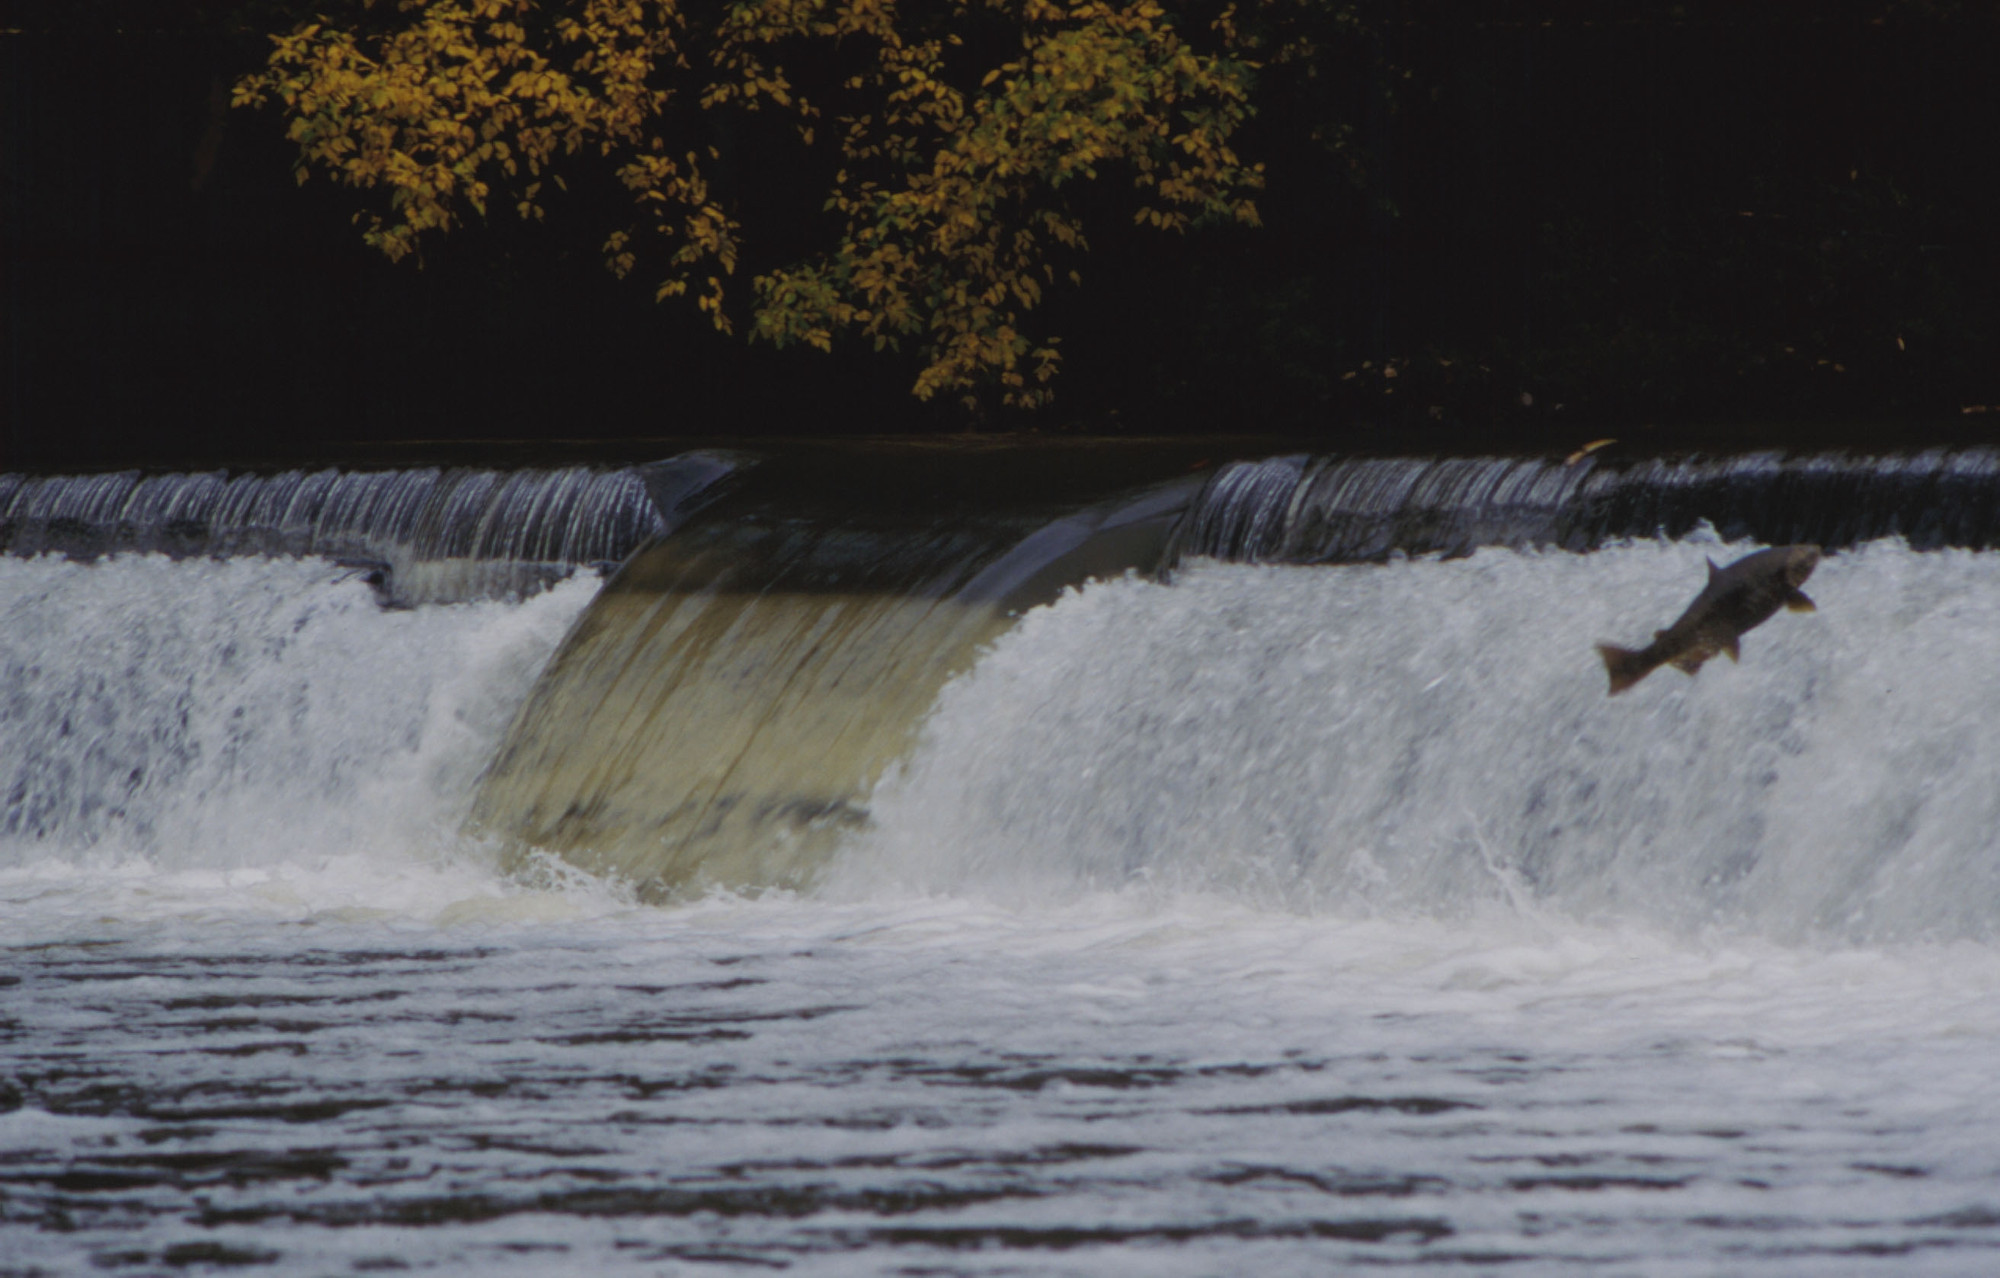 Humber River fish migration Chinook salmon